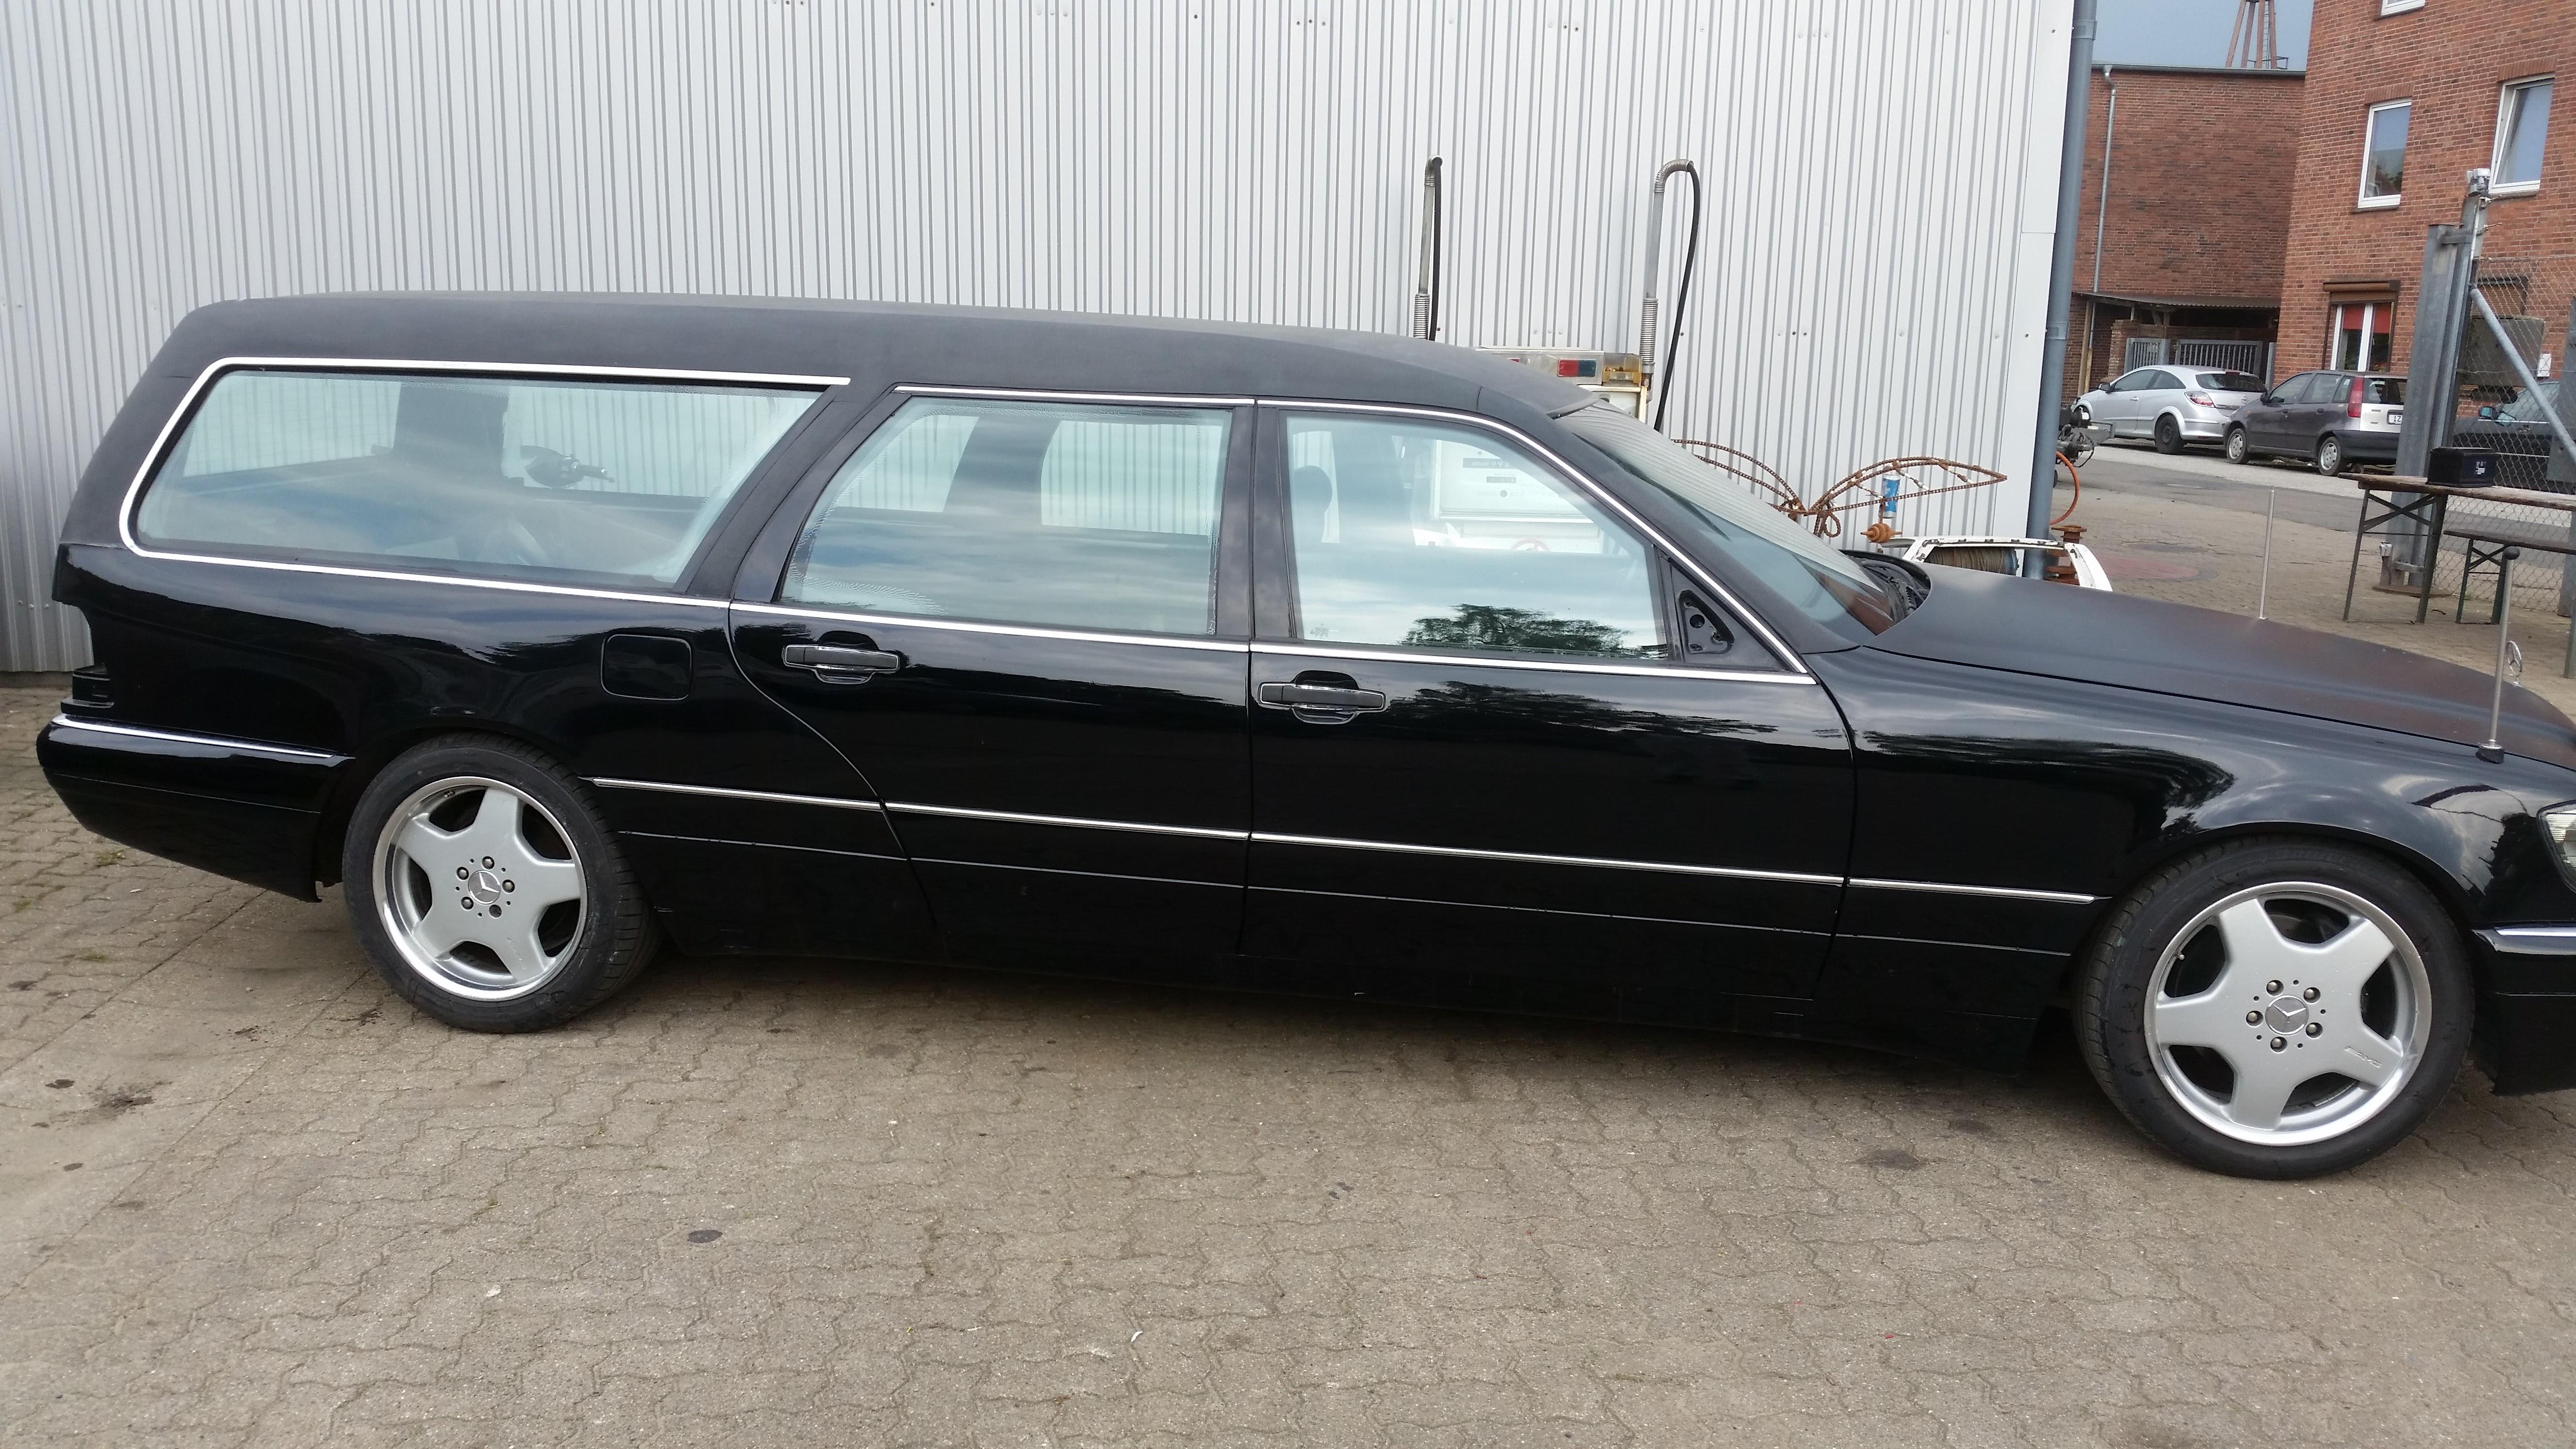 1997 mercedes w140 s klasse kombi dein auto. Black Bedroom Furniture Sets. Home Design Ideas